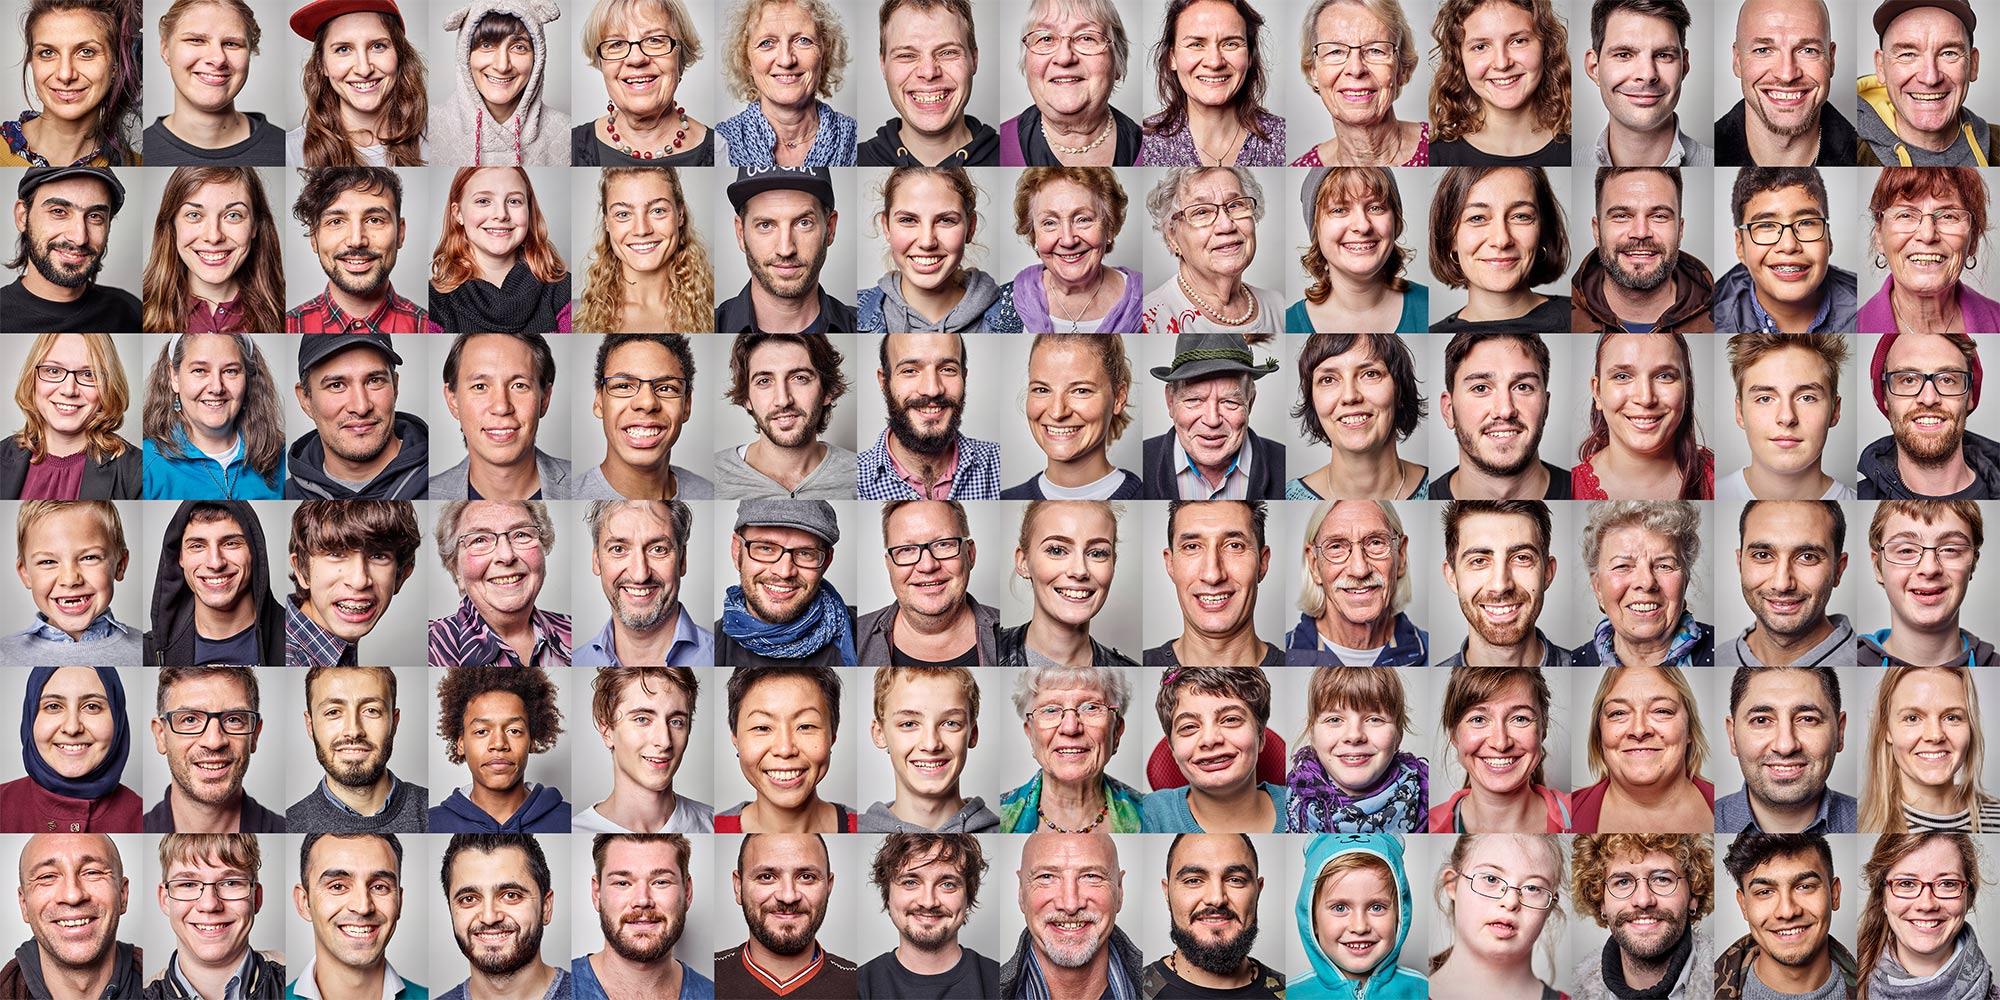 Norm braucht Vielfalt Fotoshooting Insel Berlin 2016